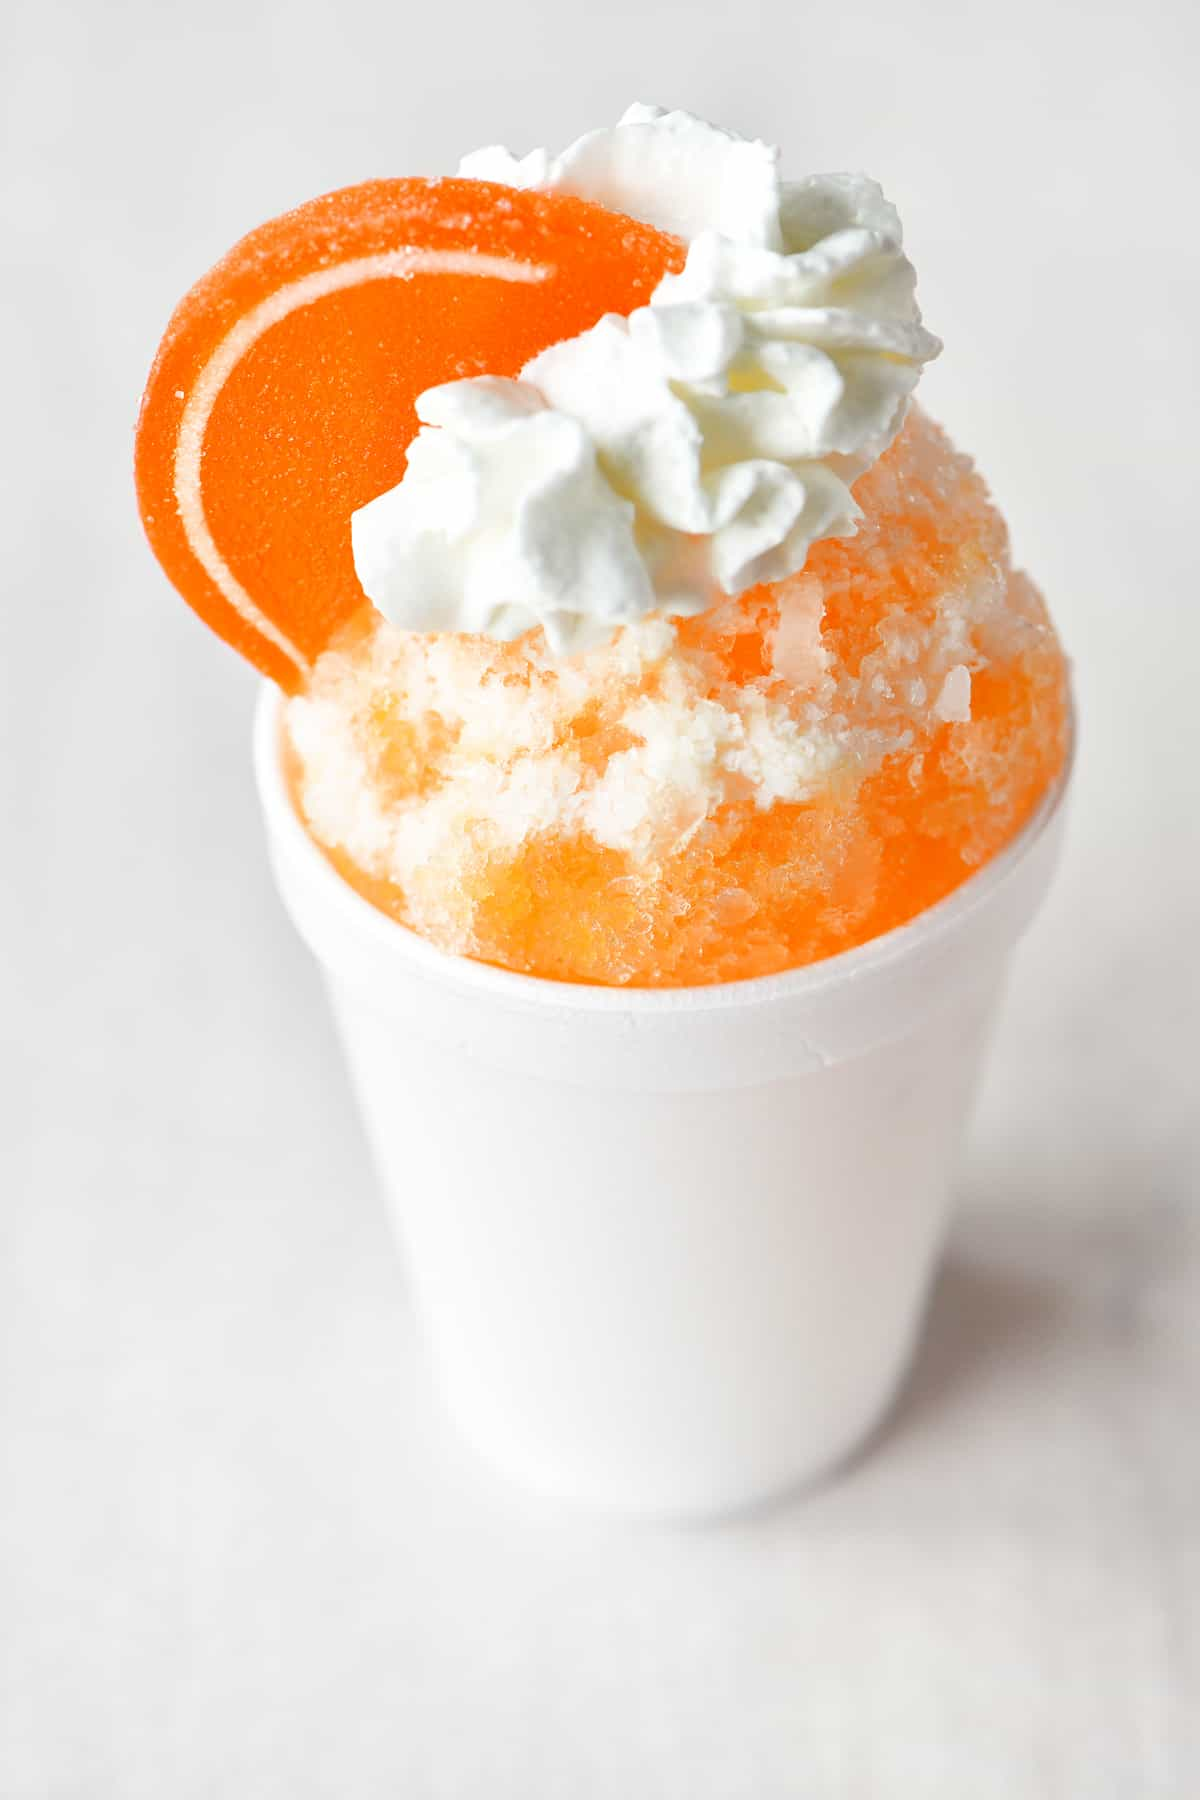 an orange-cream flavored shave ice treat, garnished with a gummy orange slice